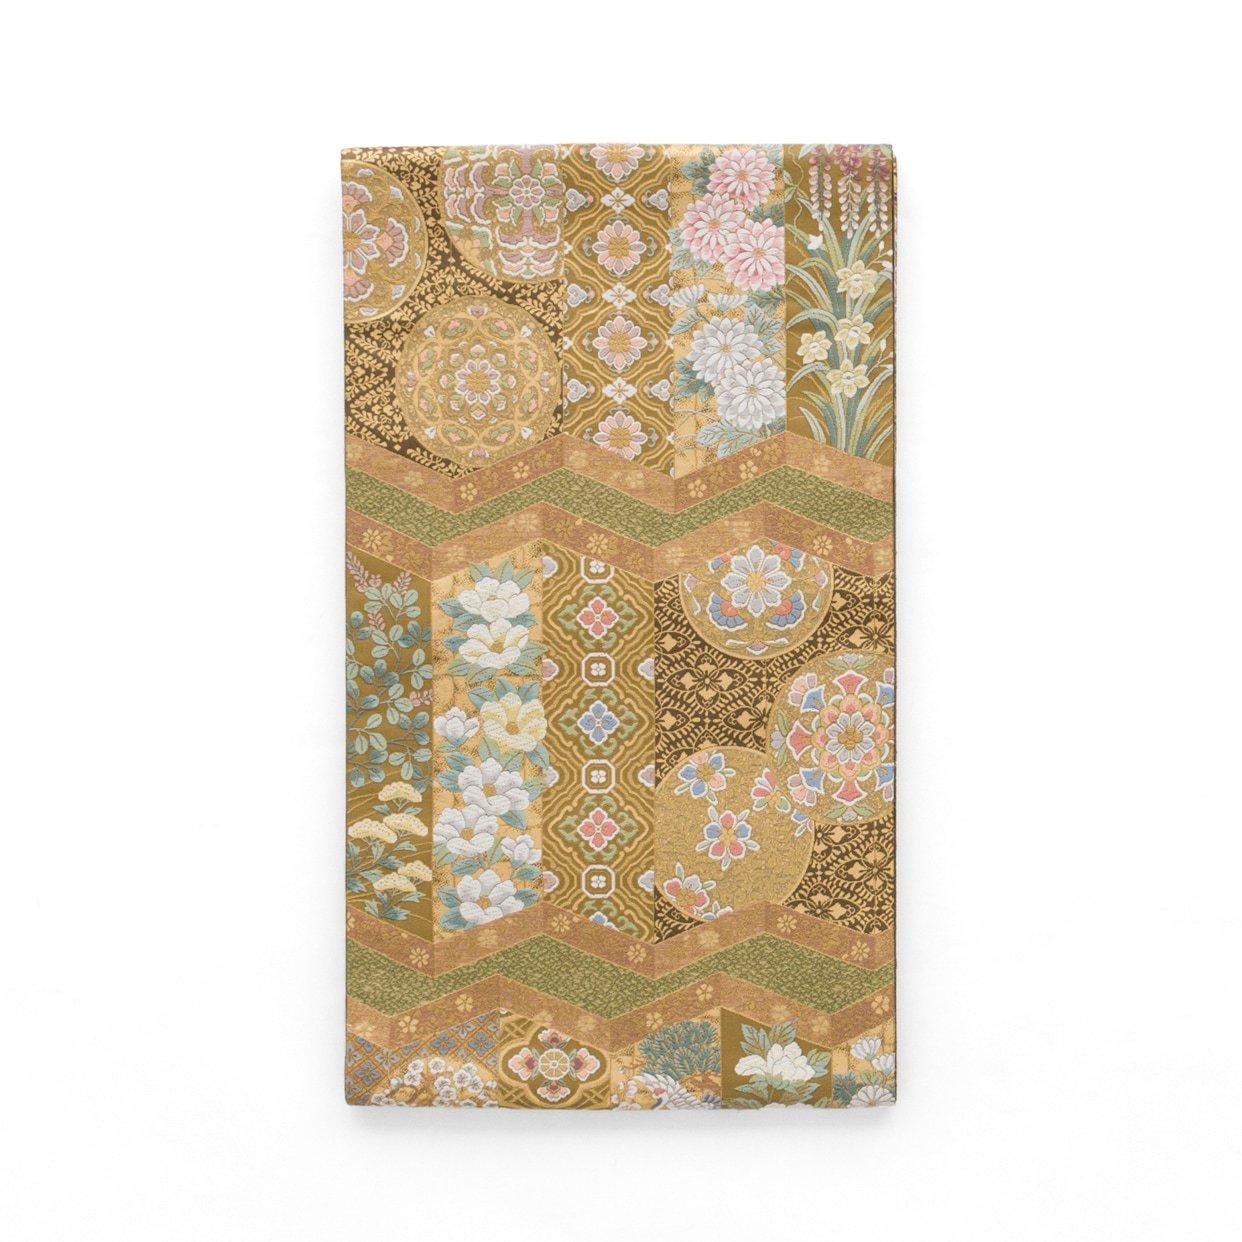 「袋帯●花屏風」の商品画像